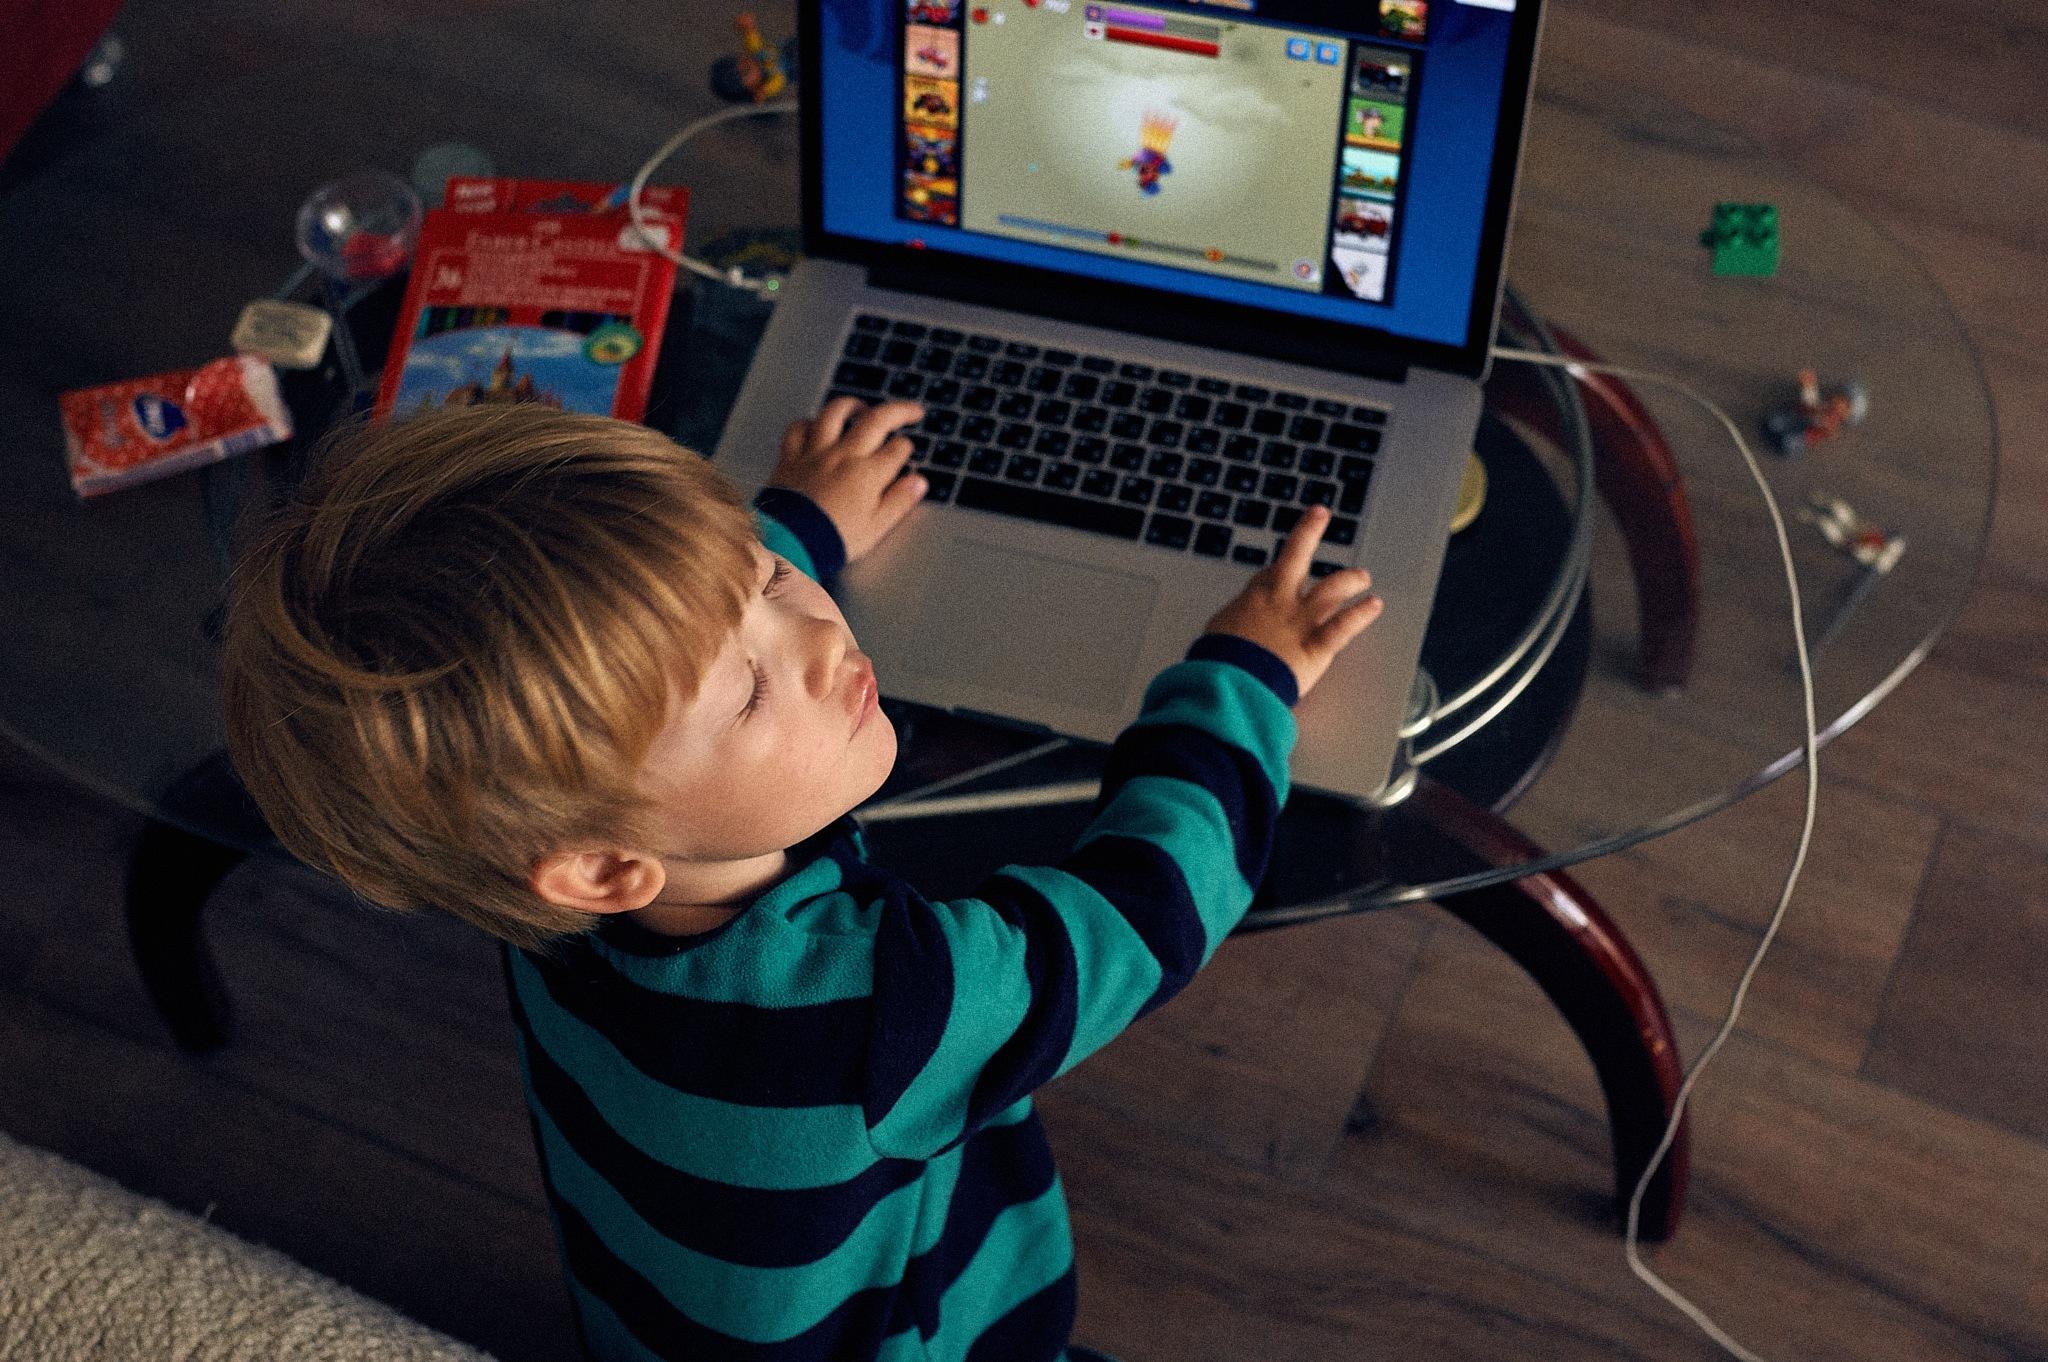 Young gamer by Konstantin Kovalev